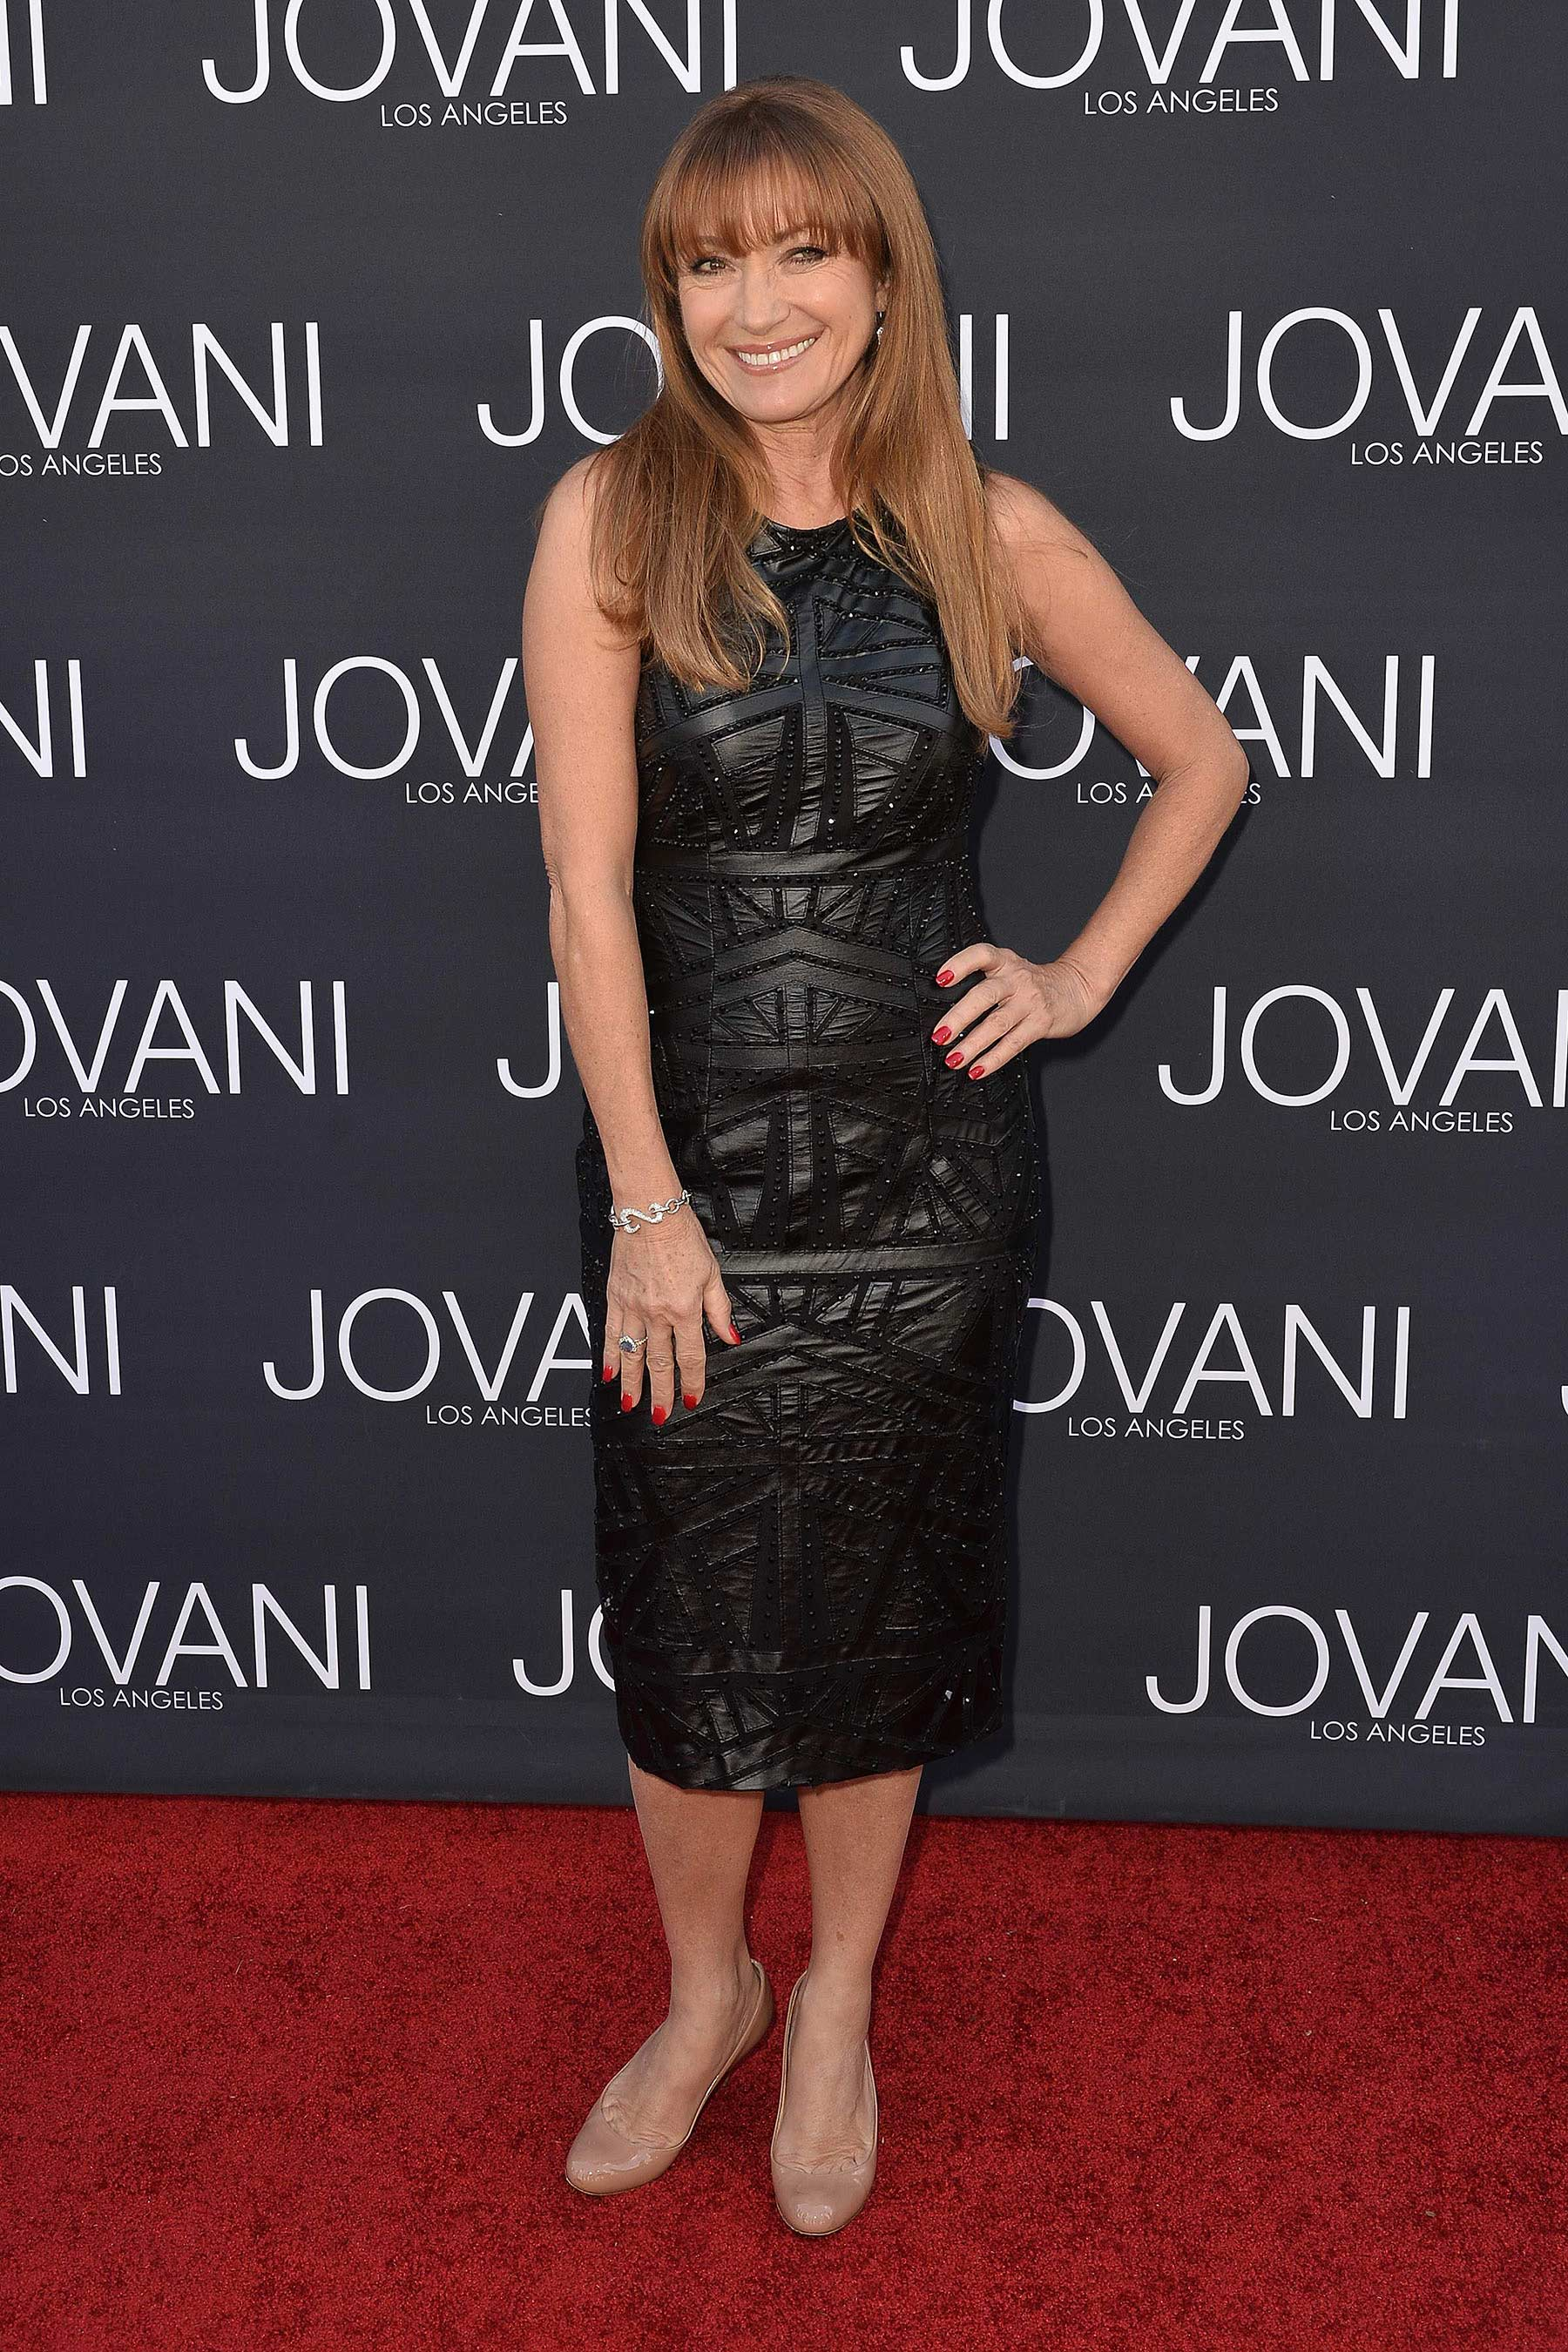 Jane Seymour at the Jovani Los Angeles Store Opening Celebration